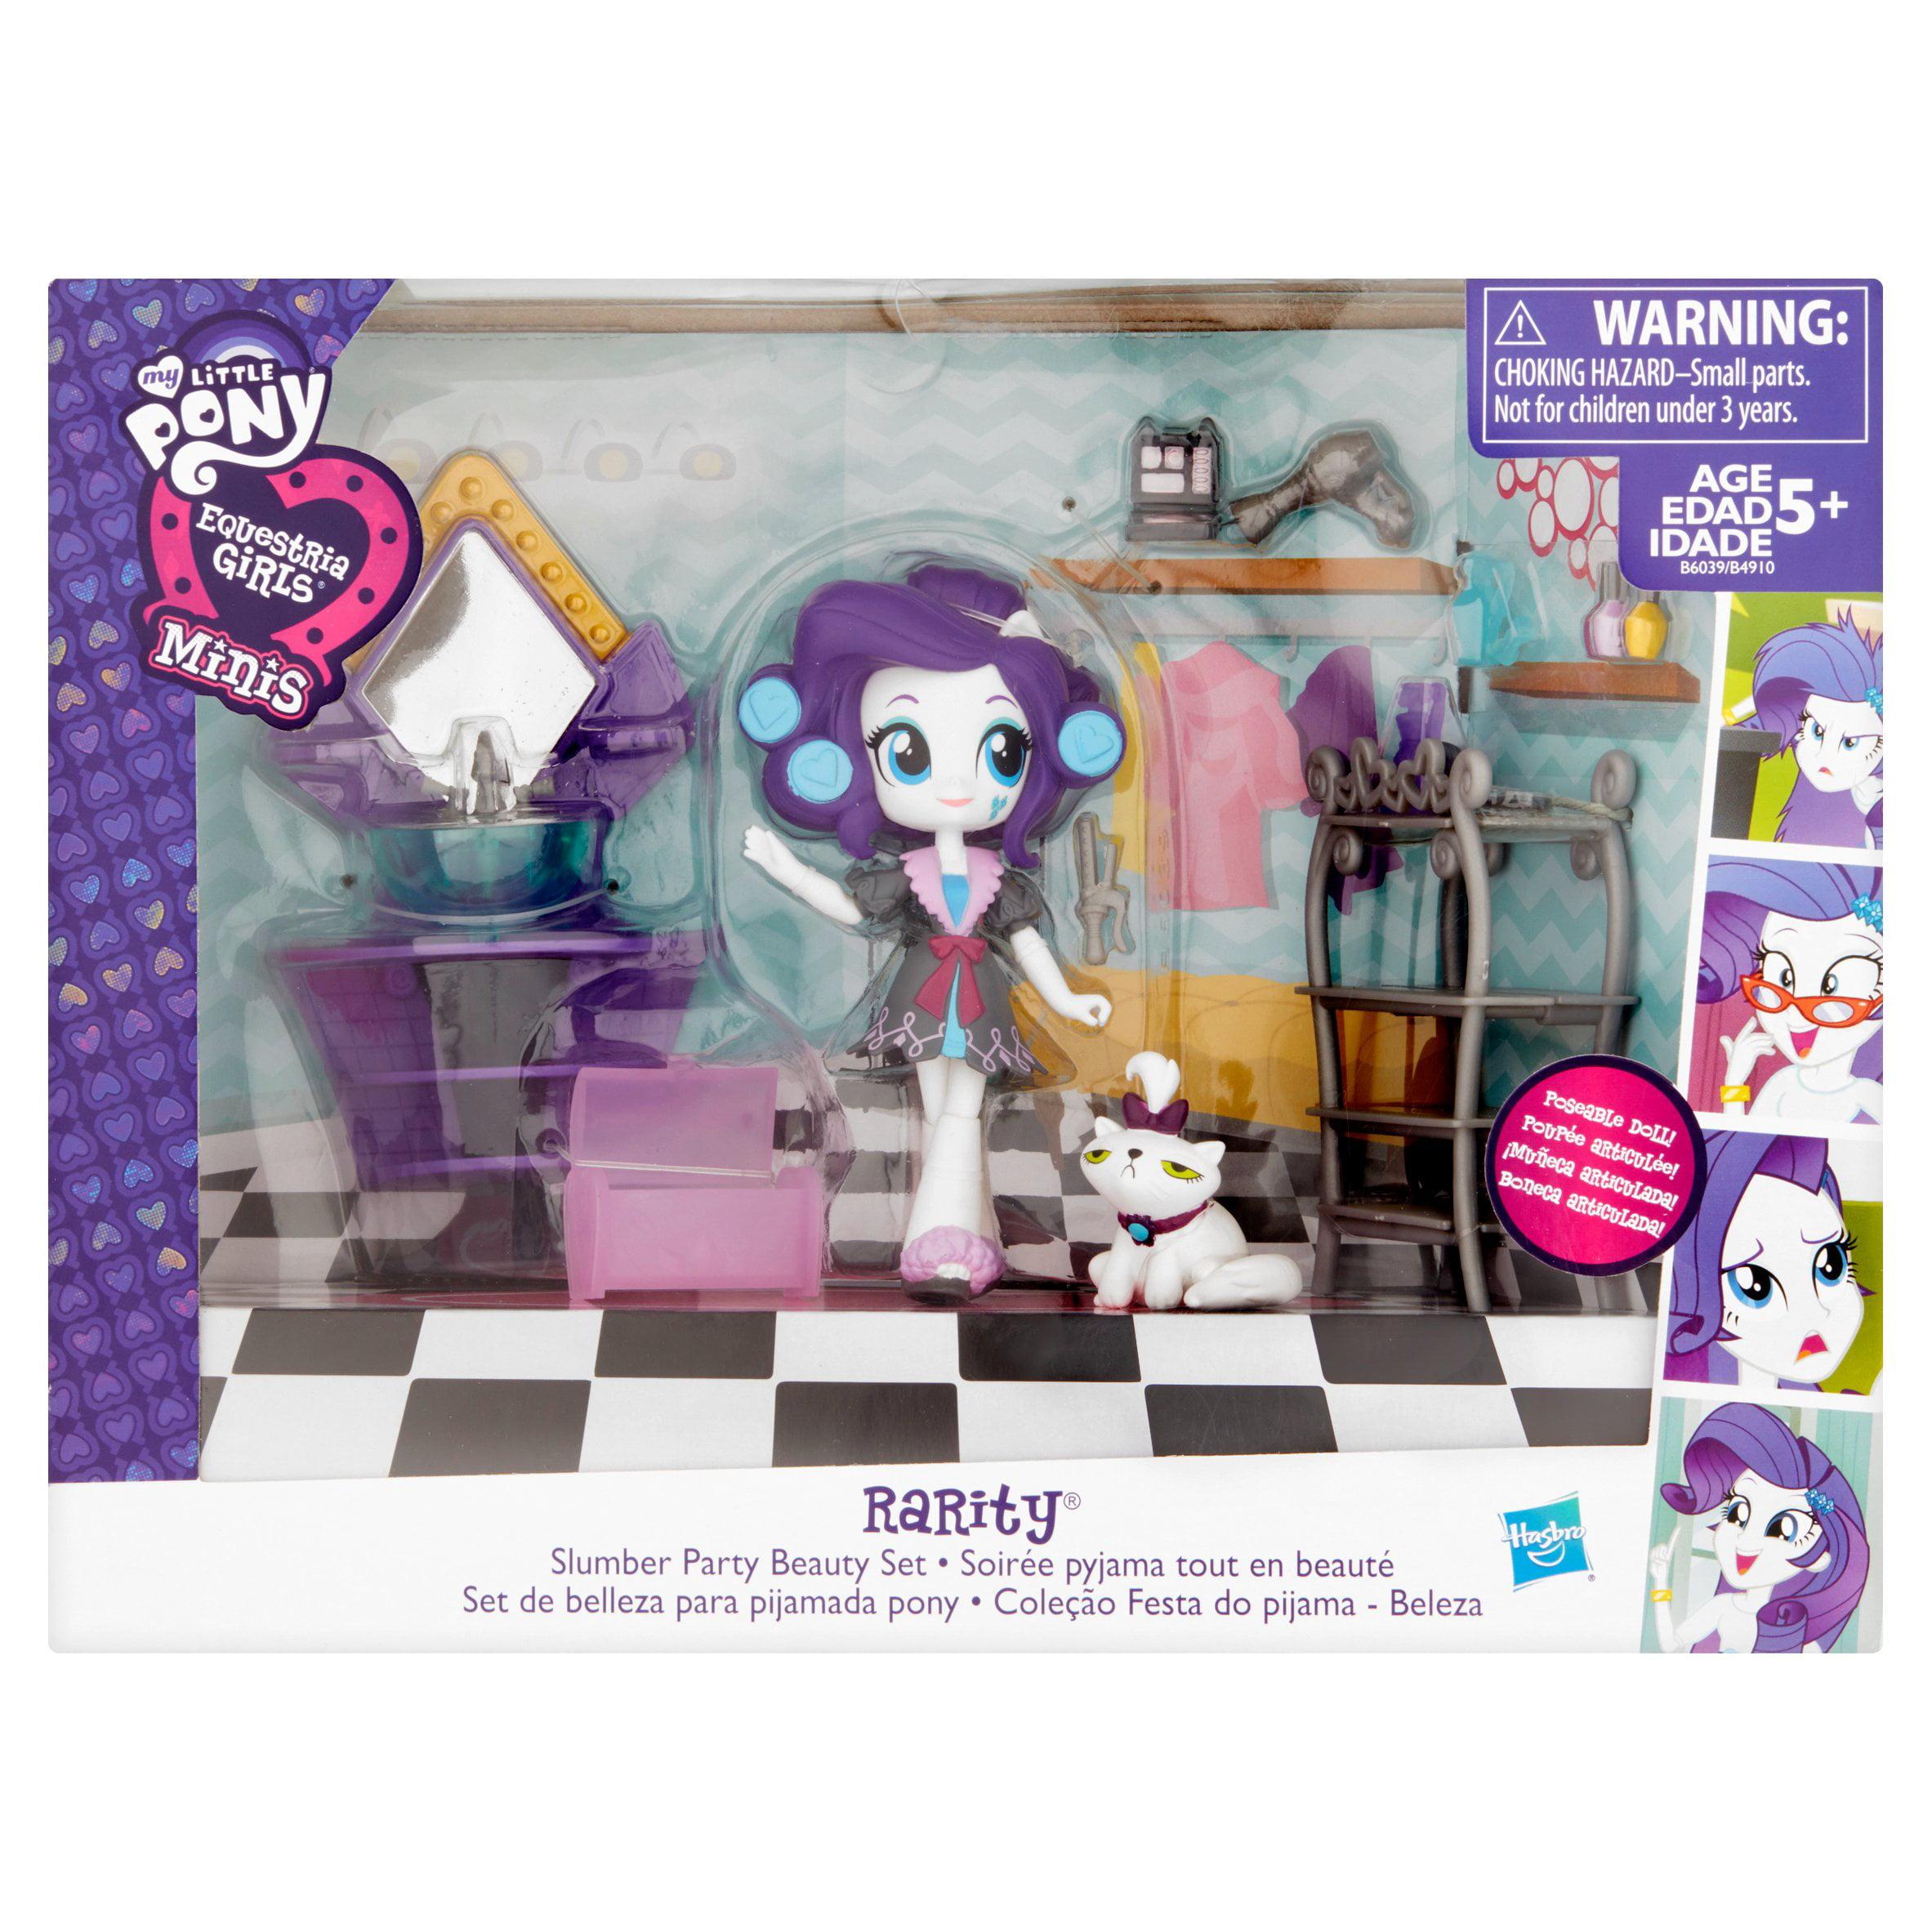 My Little Pony Equestria Girls Minis Rarity Slumber Party Beauty Set by Hasbro